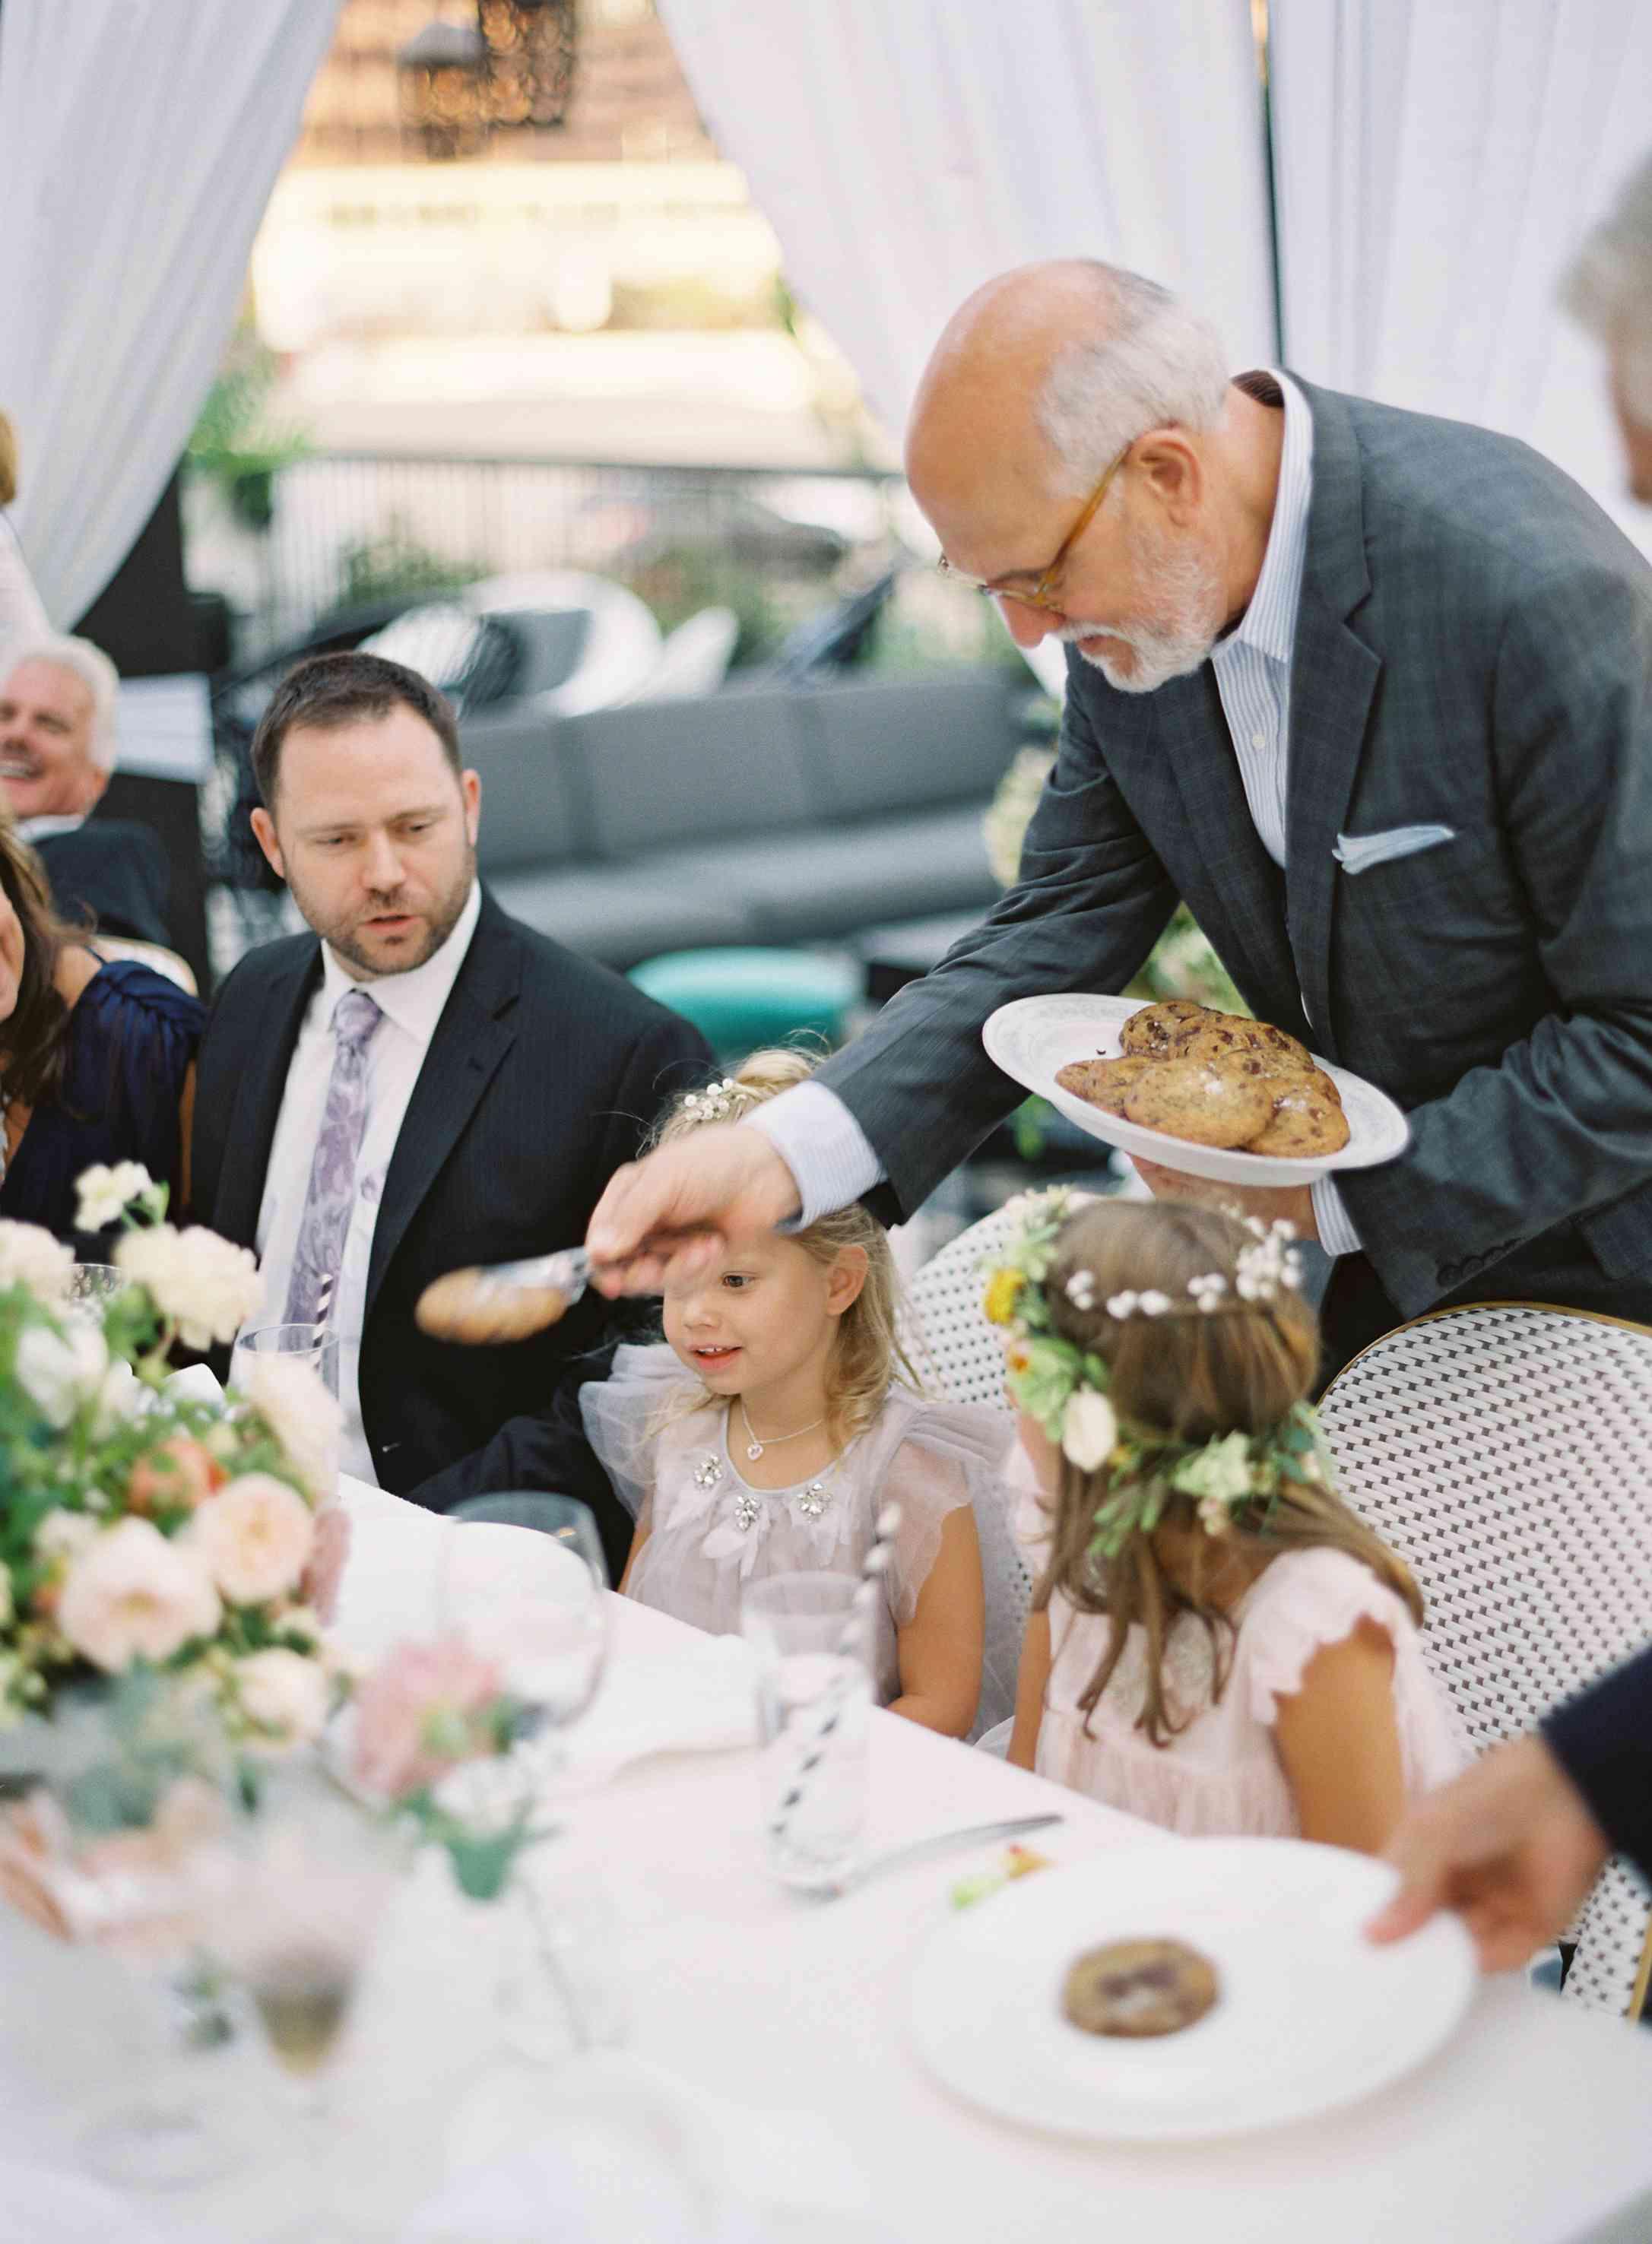 Dinner served family-style